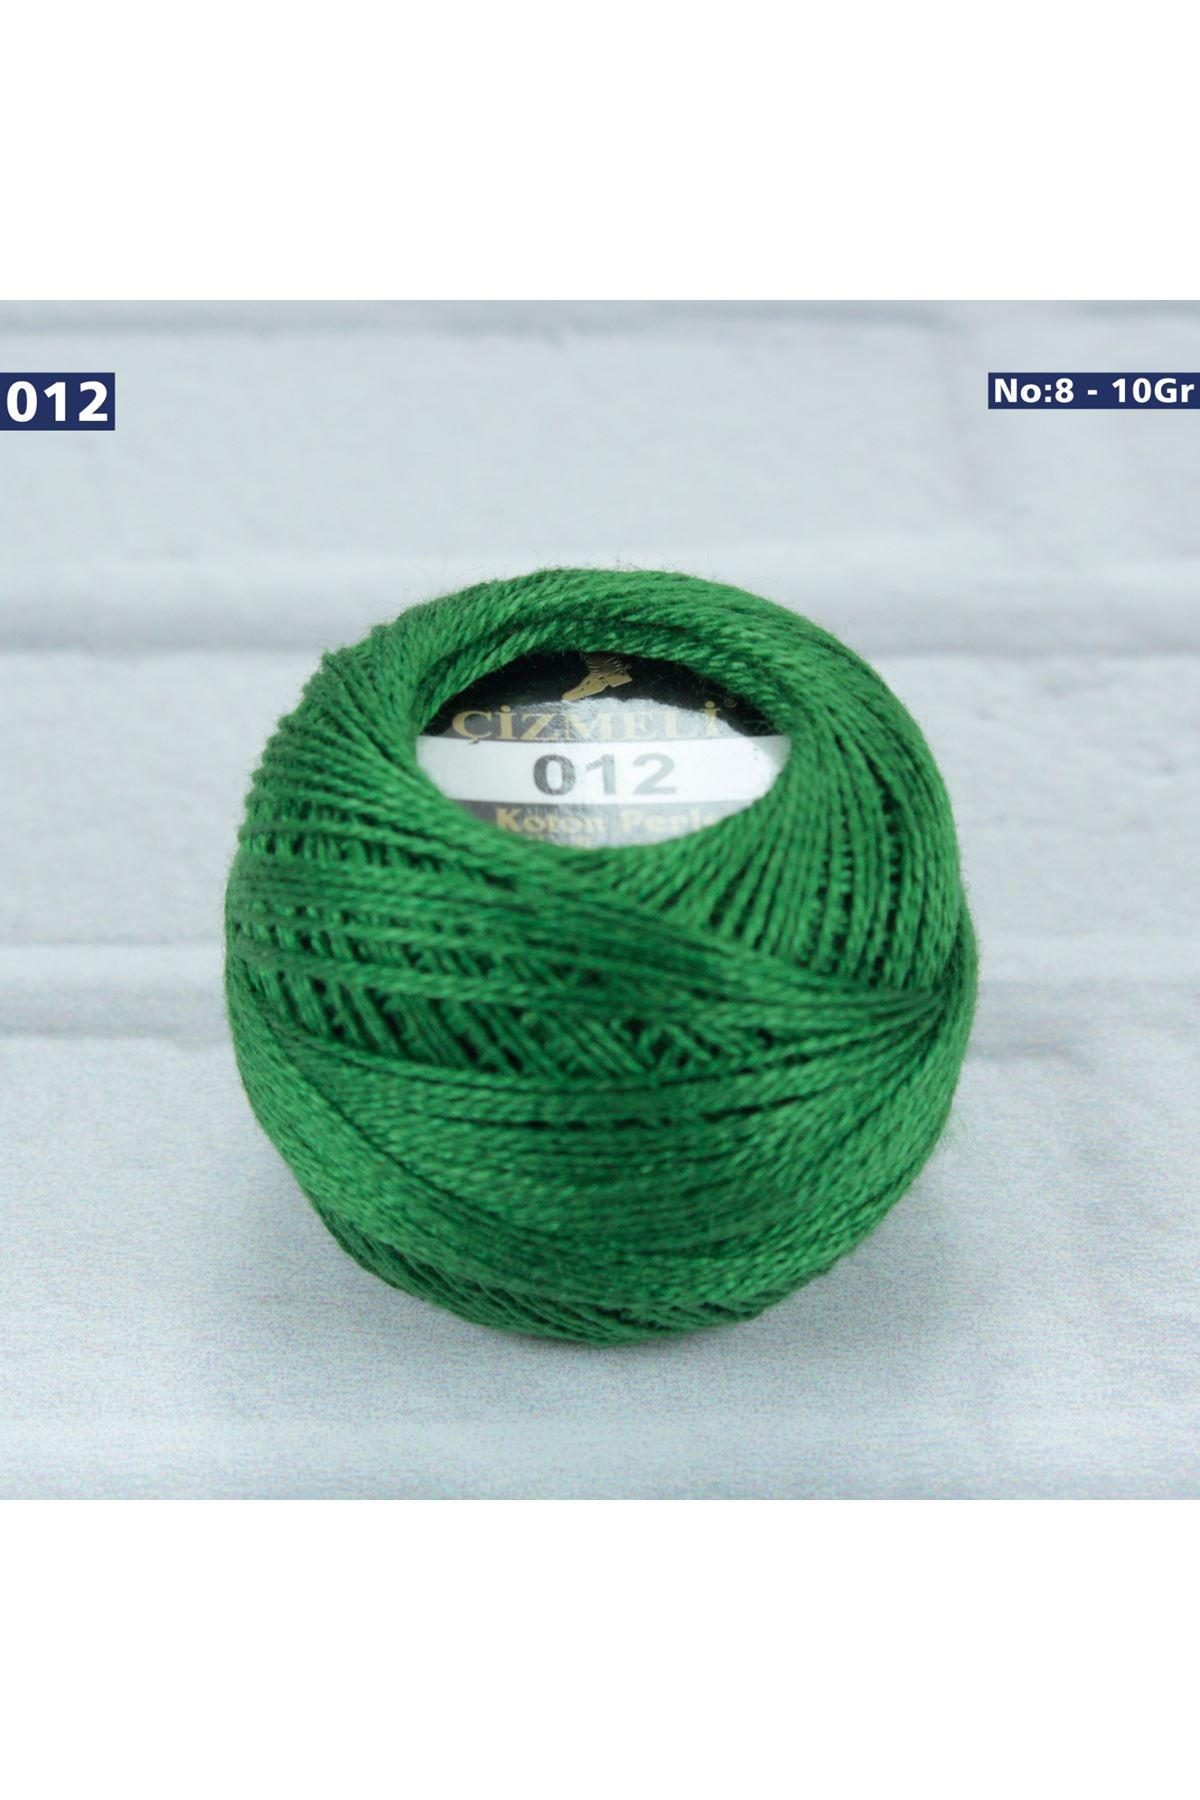 Çizmeli Cotton Perle Nakış İpliği No: 012